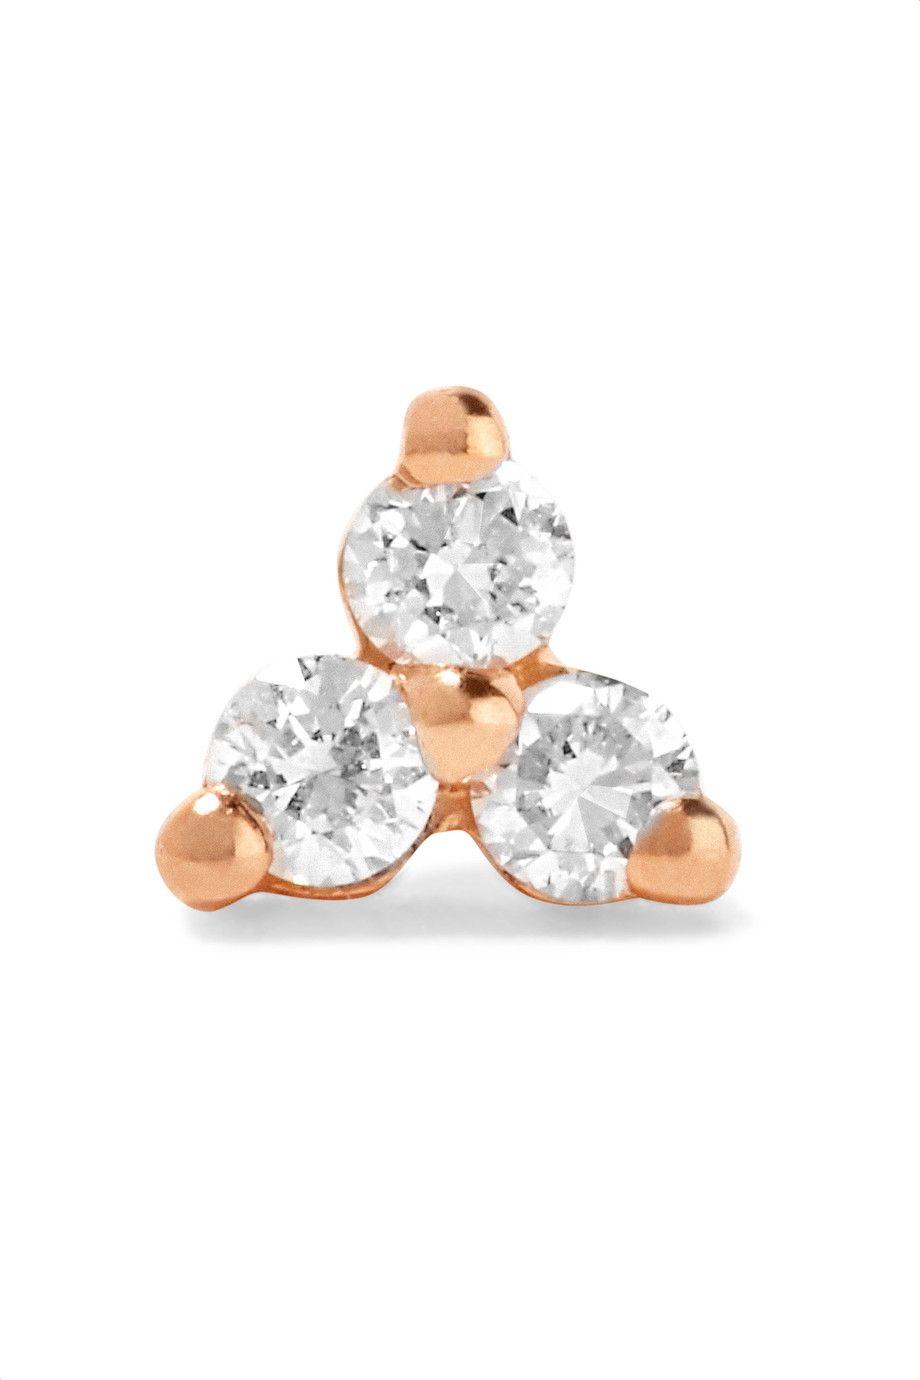 "<p>Maria Tash, Rose Gold Diamond Earring, $220; <a href=""https://www.net-a-porter.com/us/en/product/822423/maria_tash/tiny-14-karat-rose-gold-diamond-earring"" data-tracking-id=""recirc-text-link"">net-a-porter.com</a></p>"